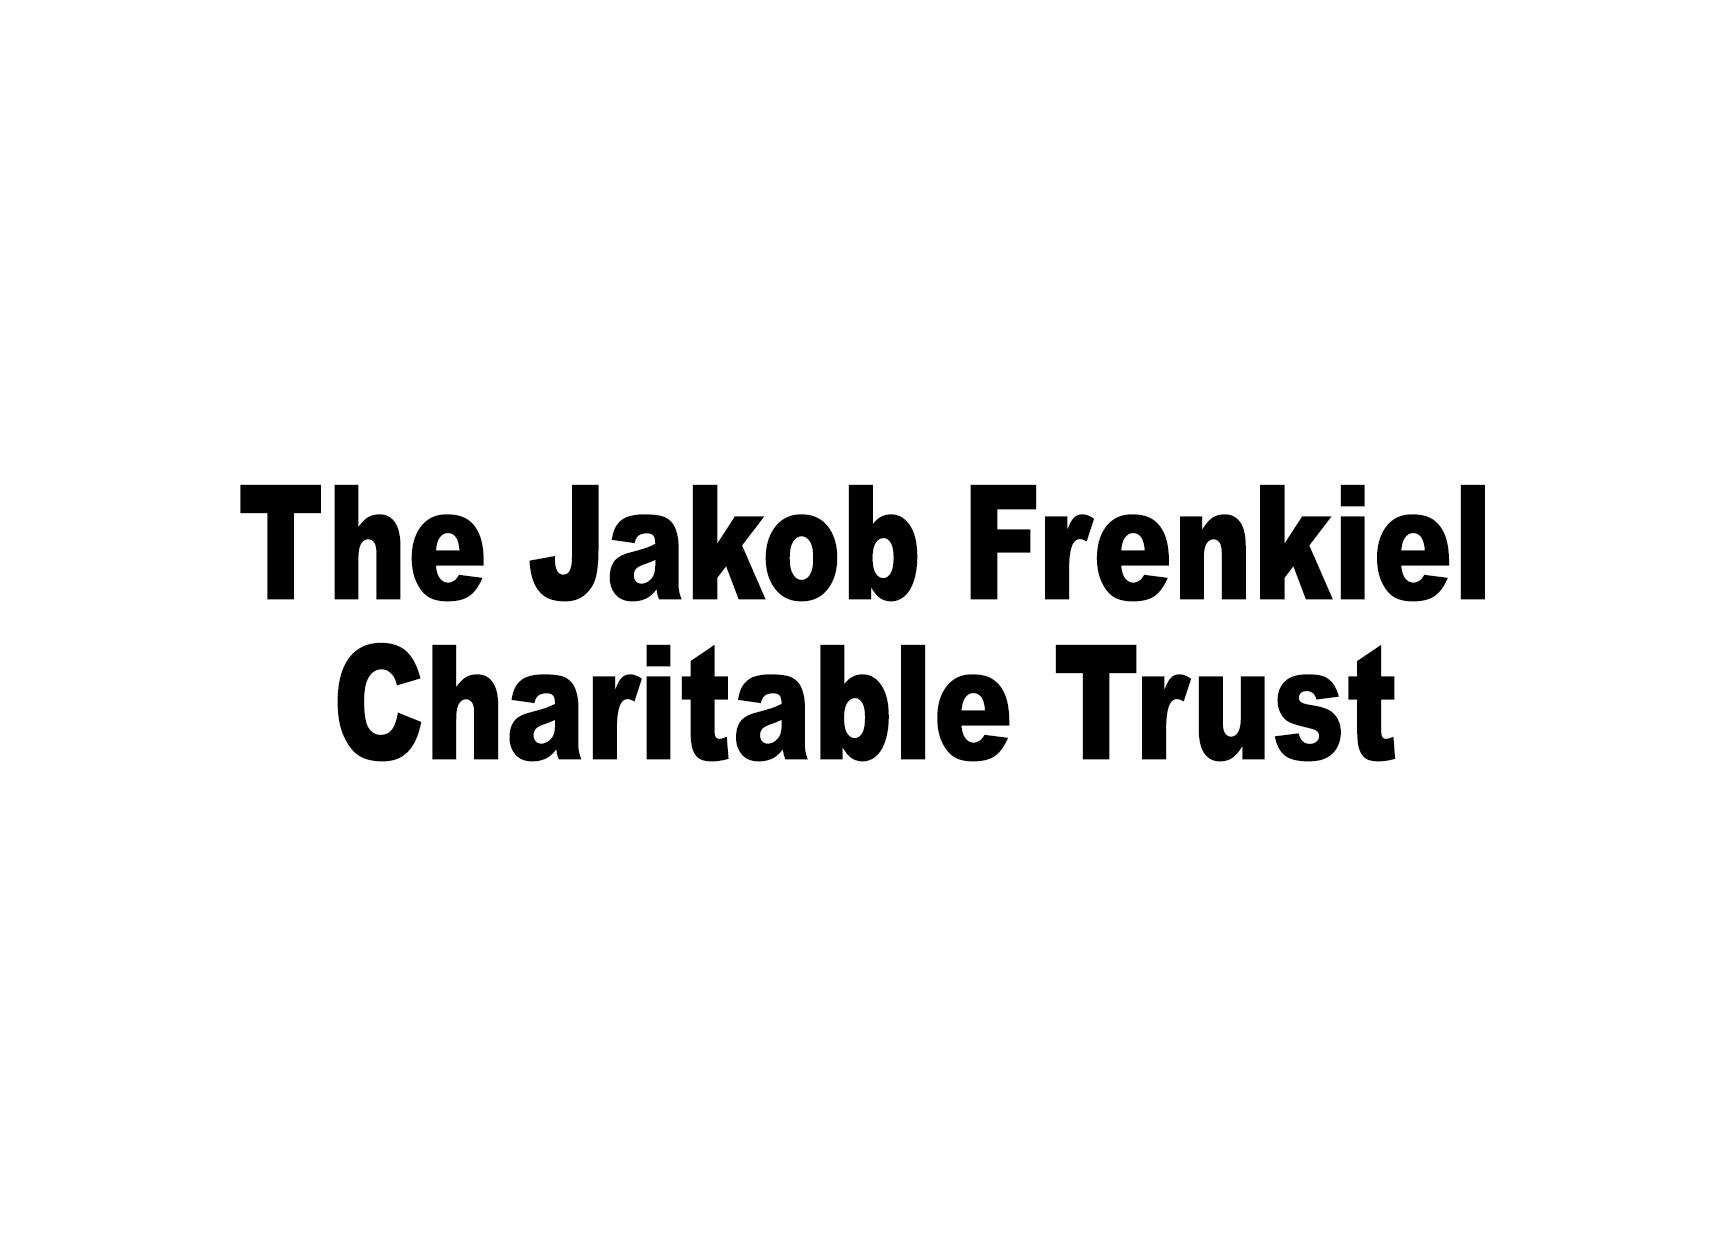 Jakob Frenkiel